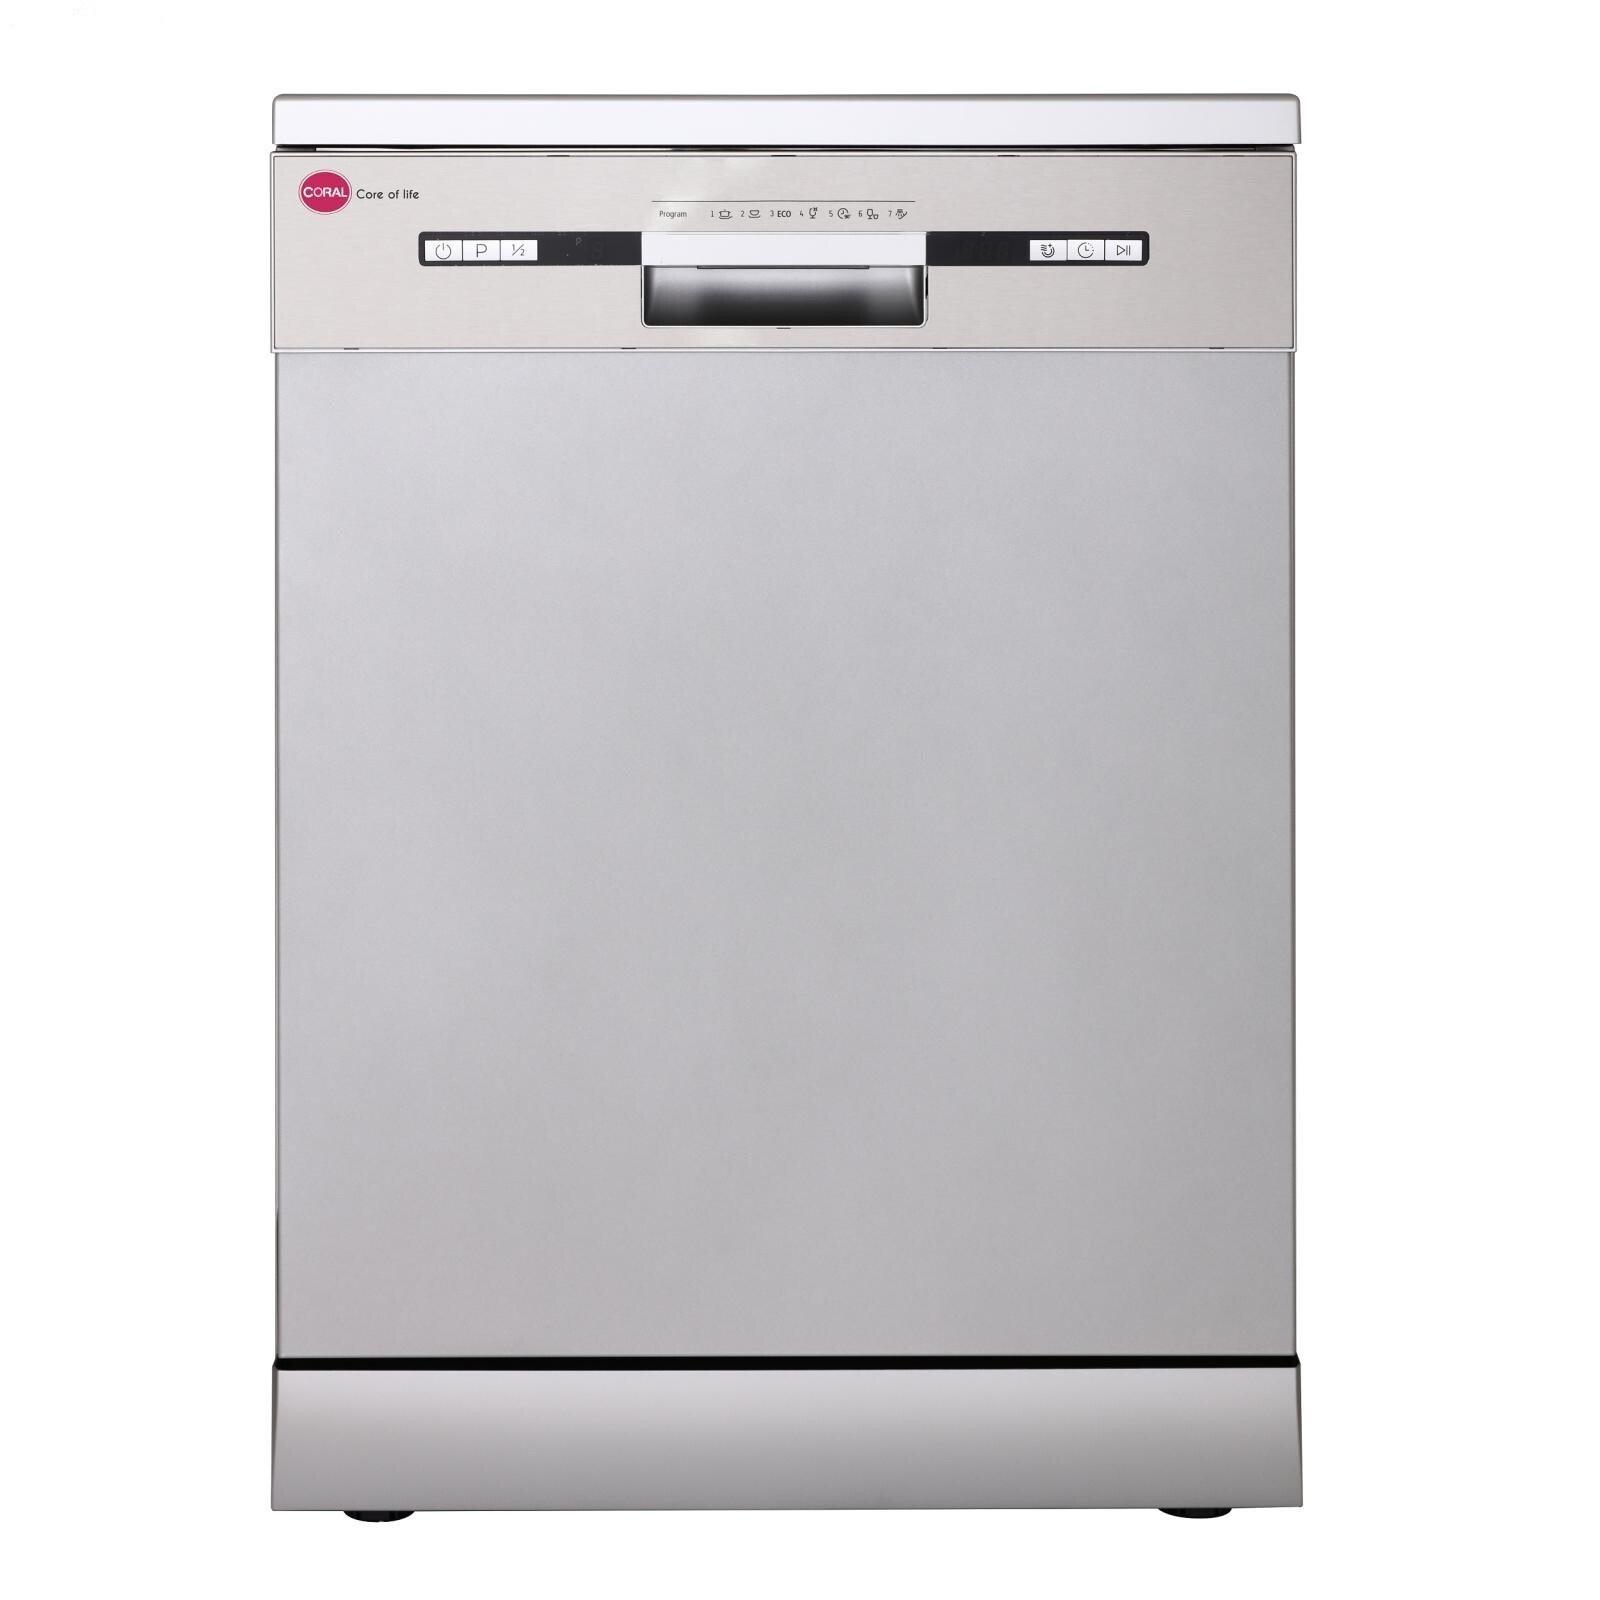 main images ماشین ظرفشویی کرال مدل DS 1417 Crawl dishwasher model DS 1417